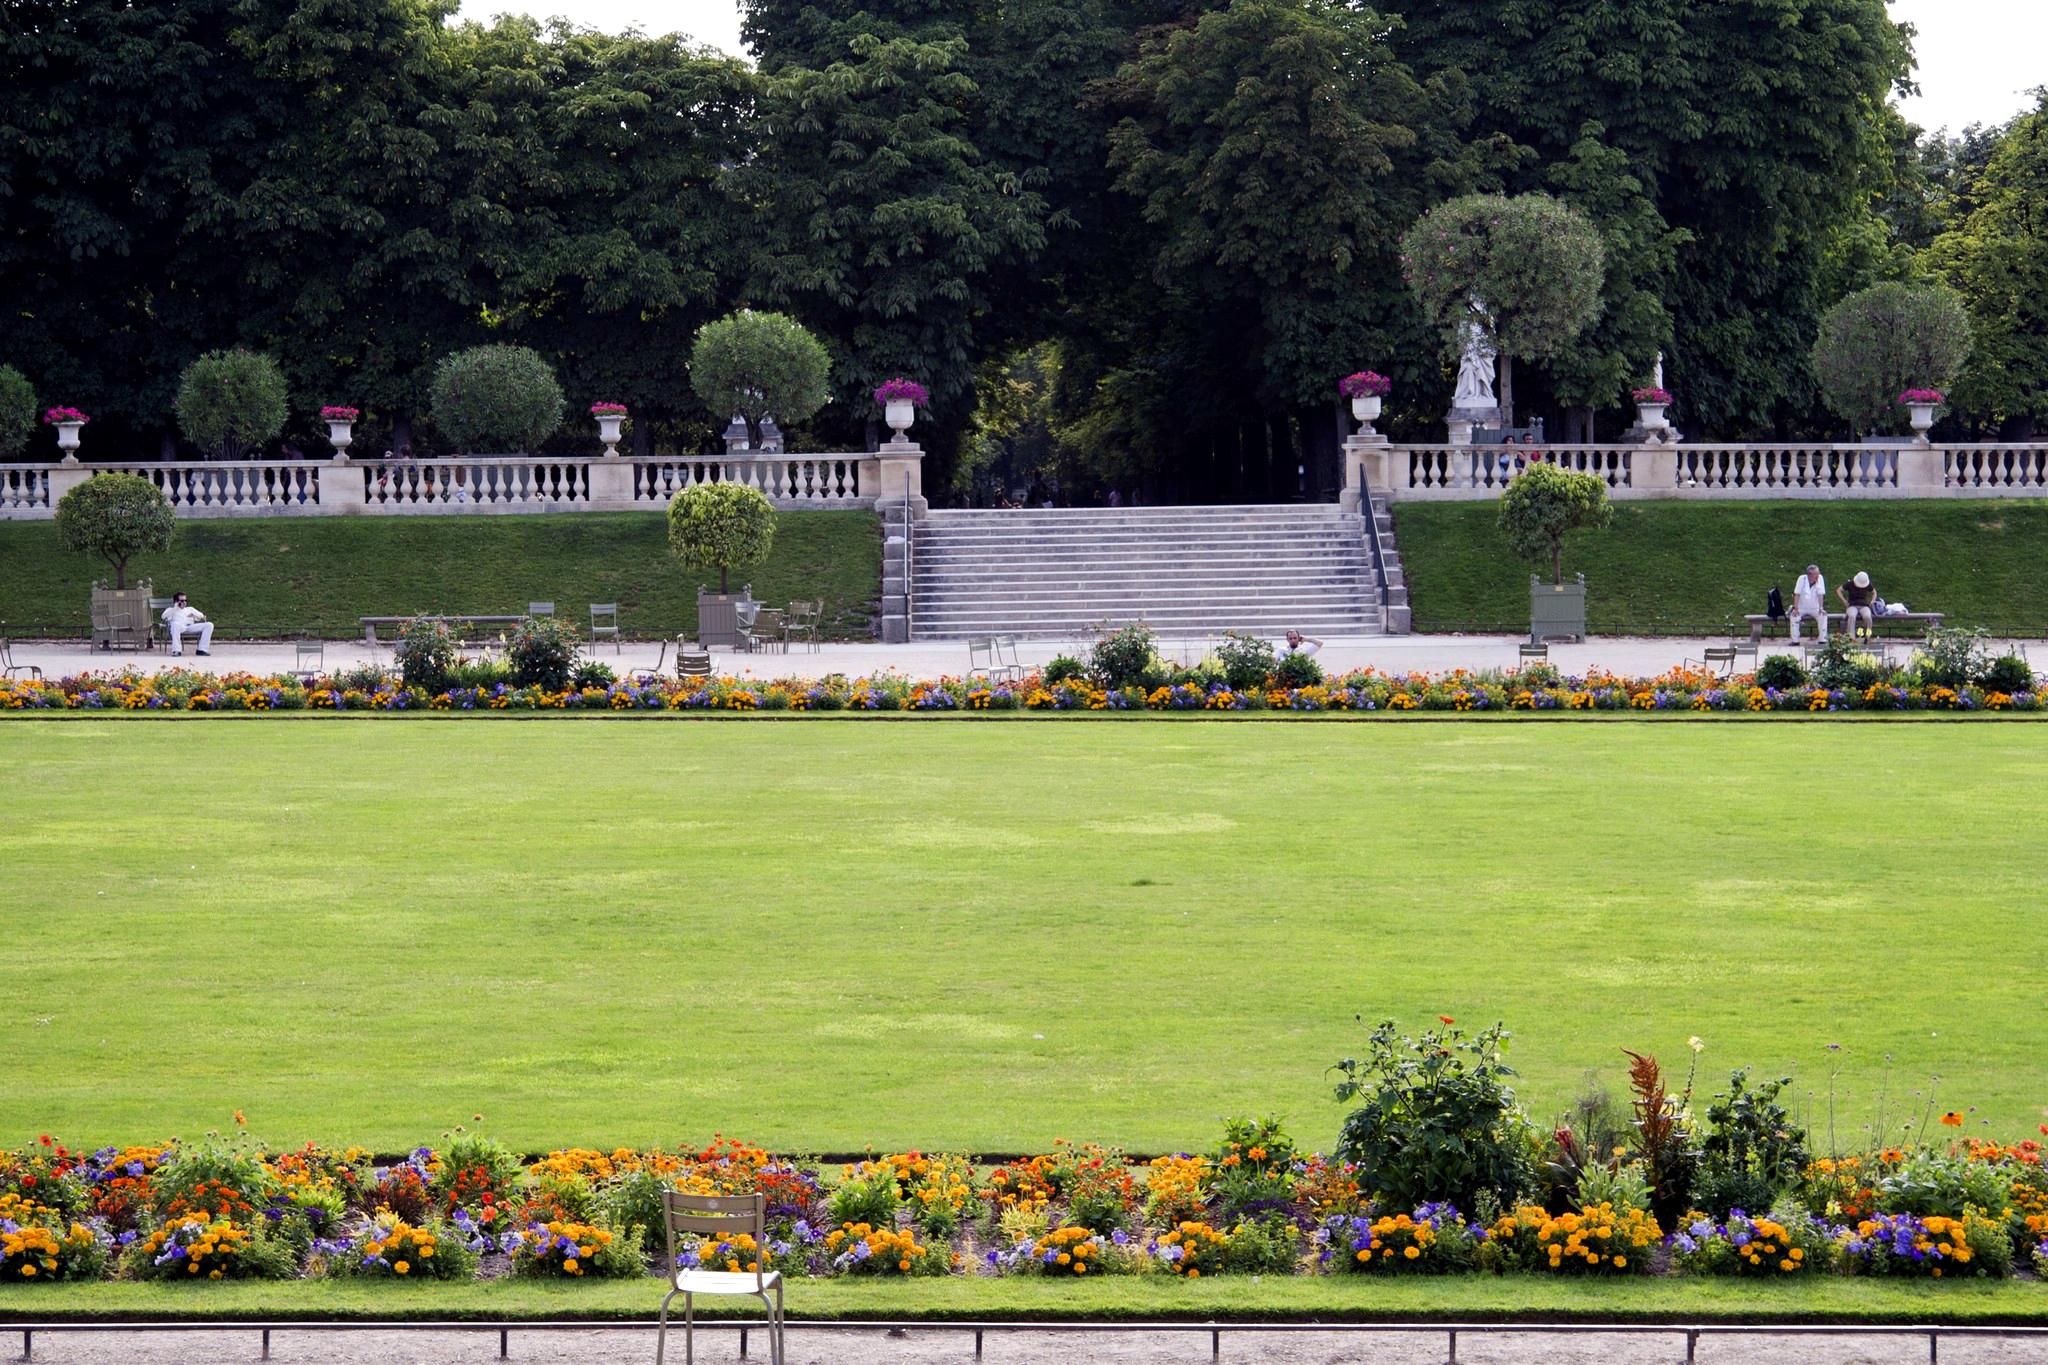 Unique le jardin du luxembourg sabakunohana for Le jardin luxembourg